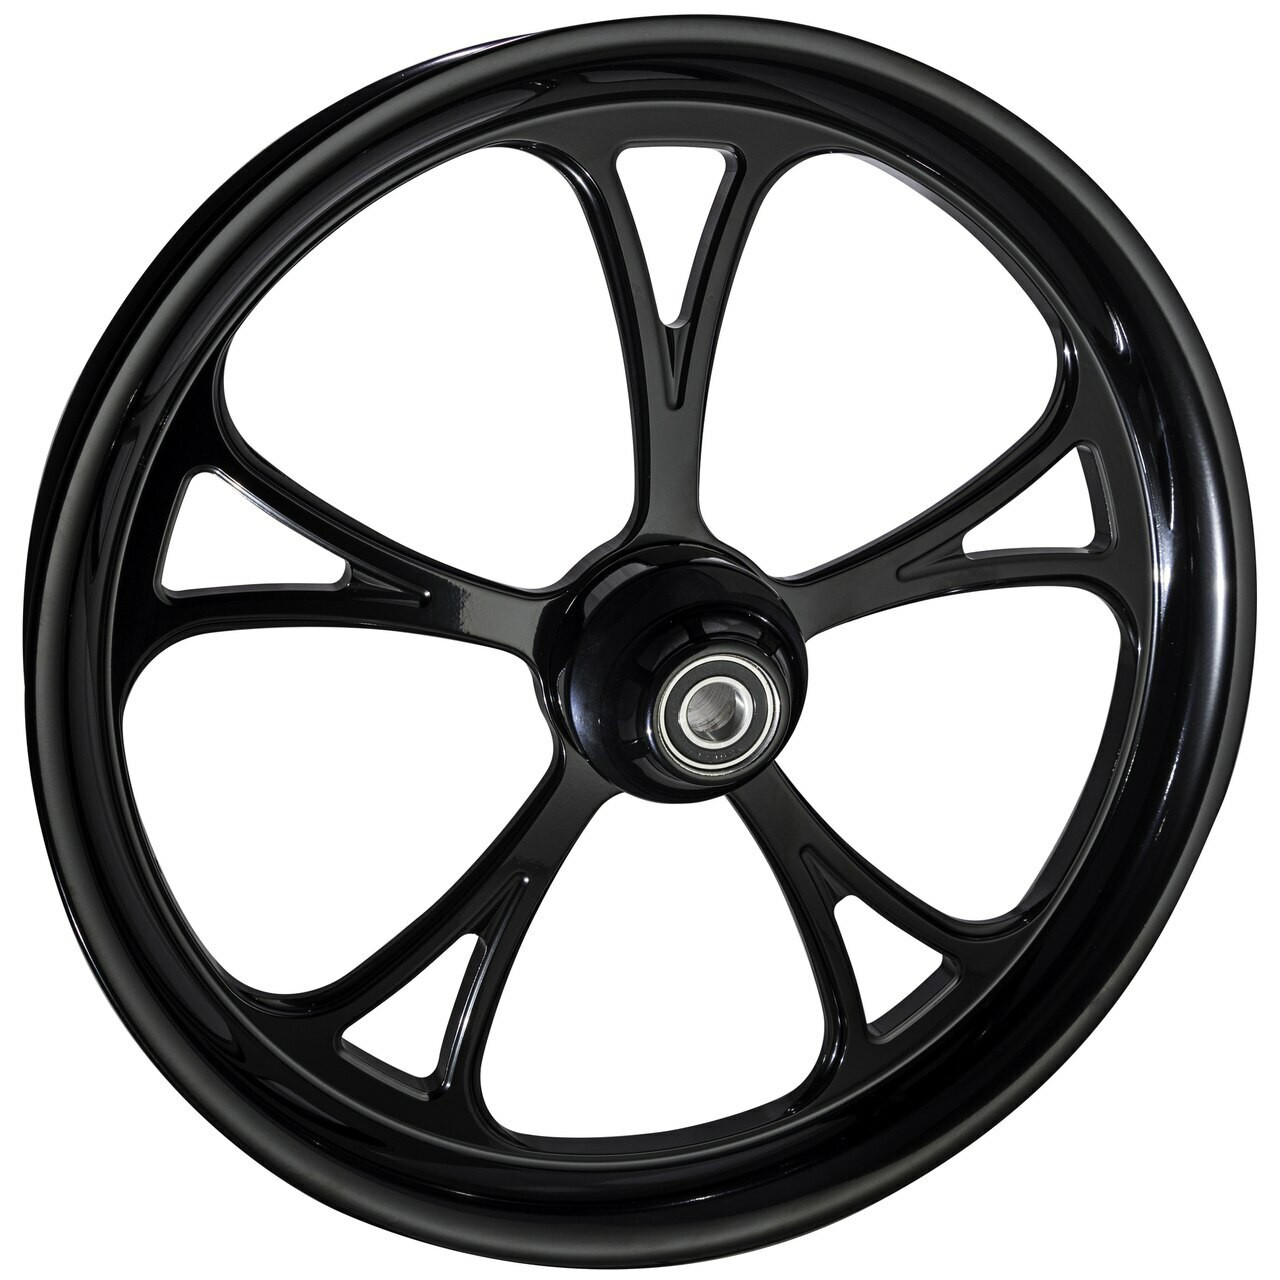 21 inch Black Road King Wheels by FTD Customs